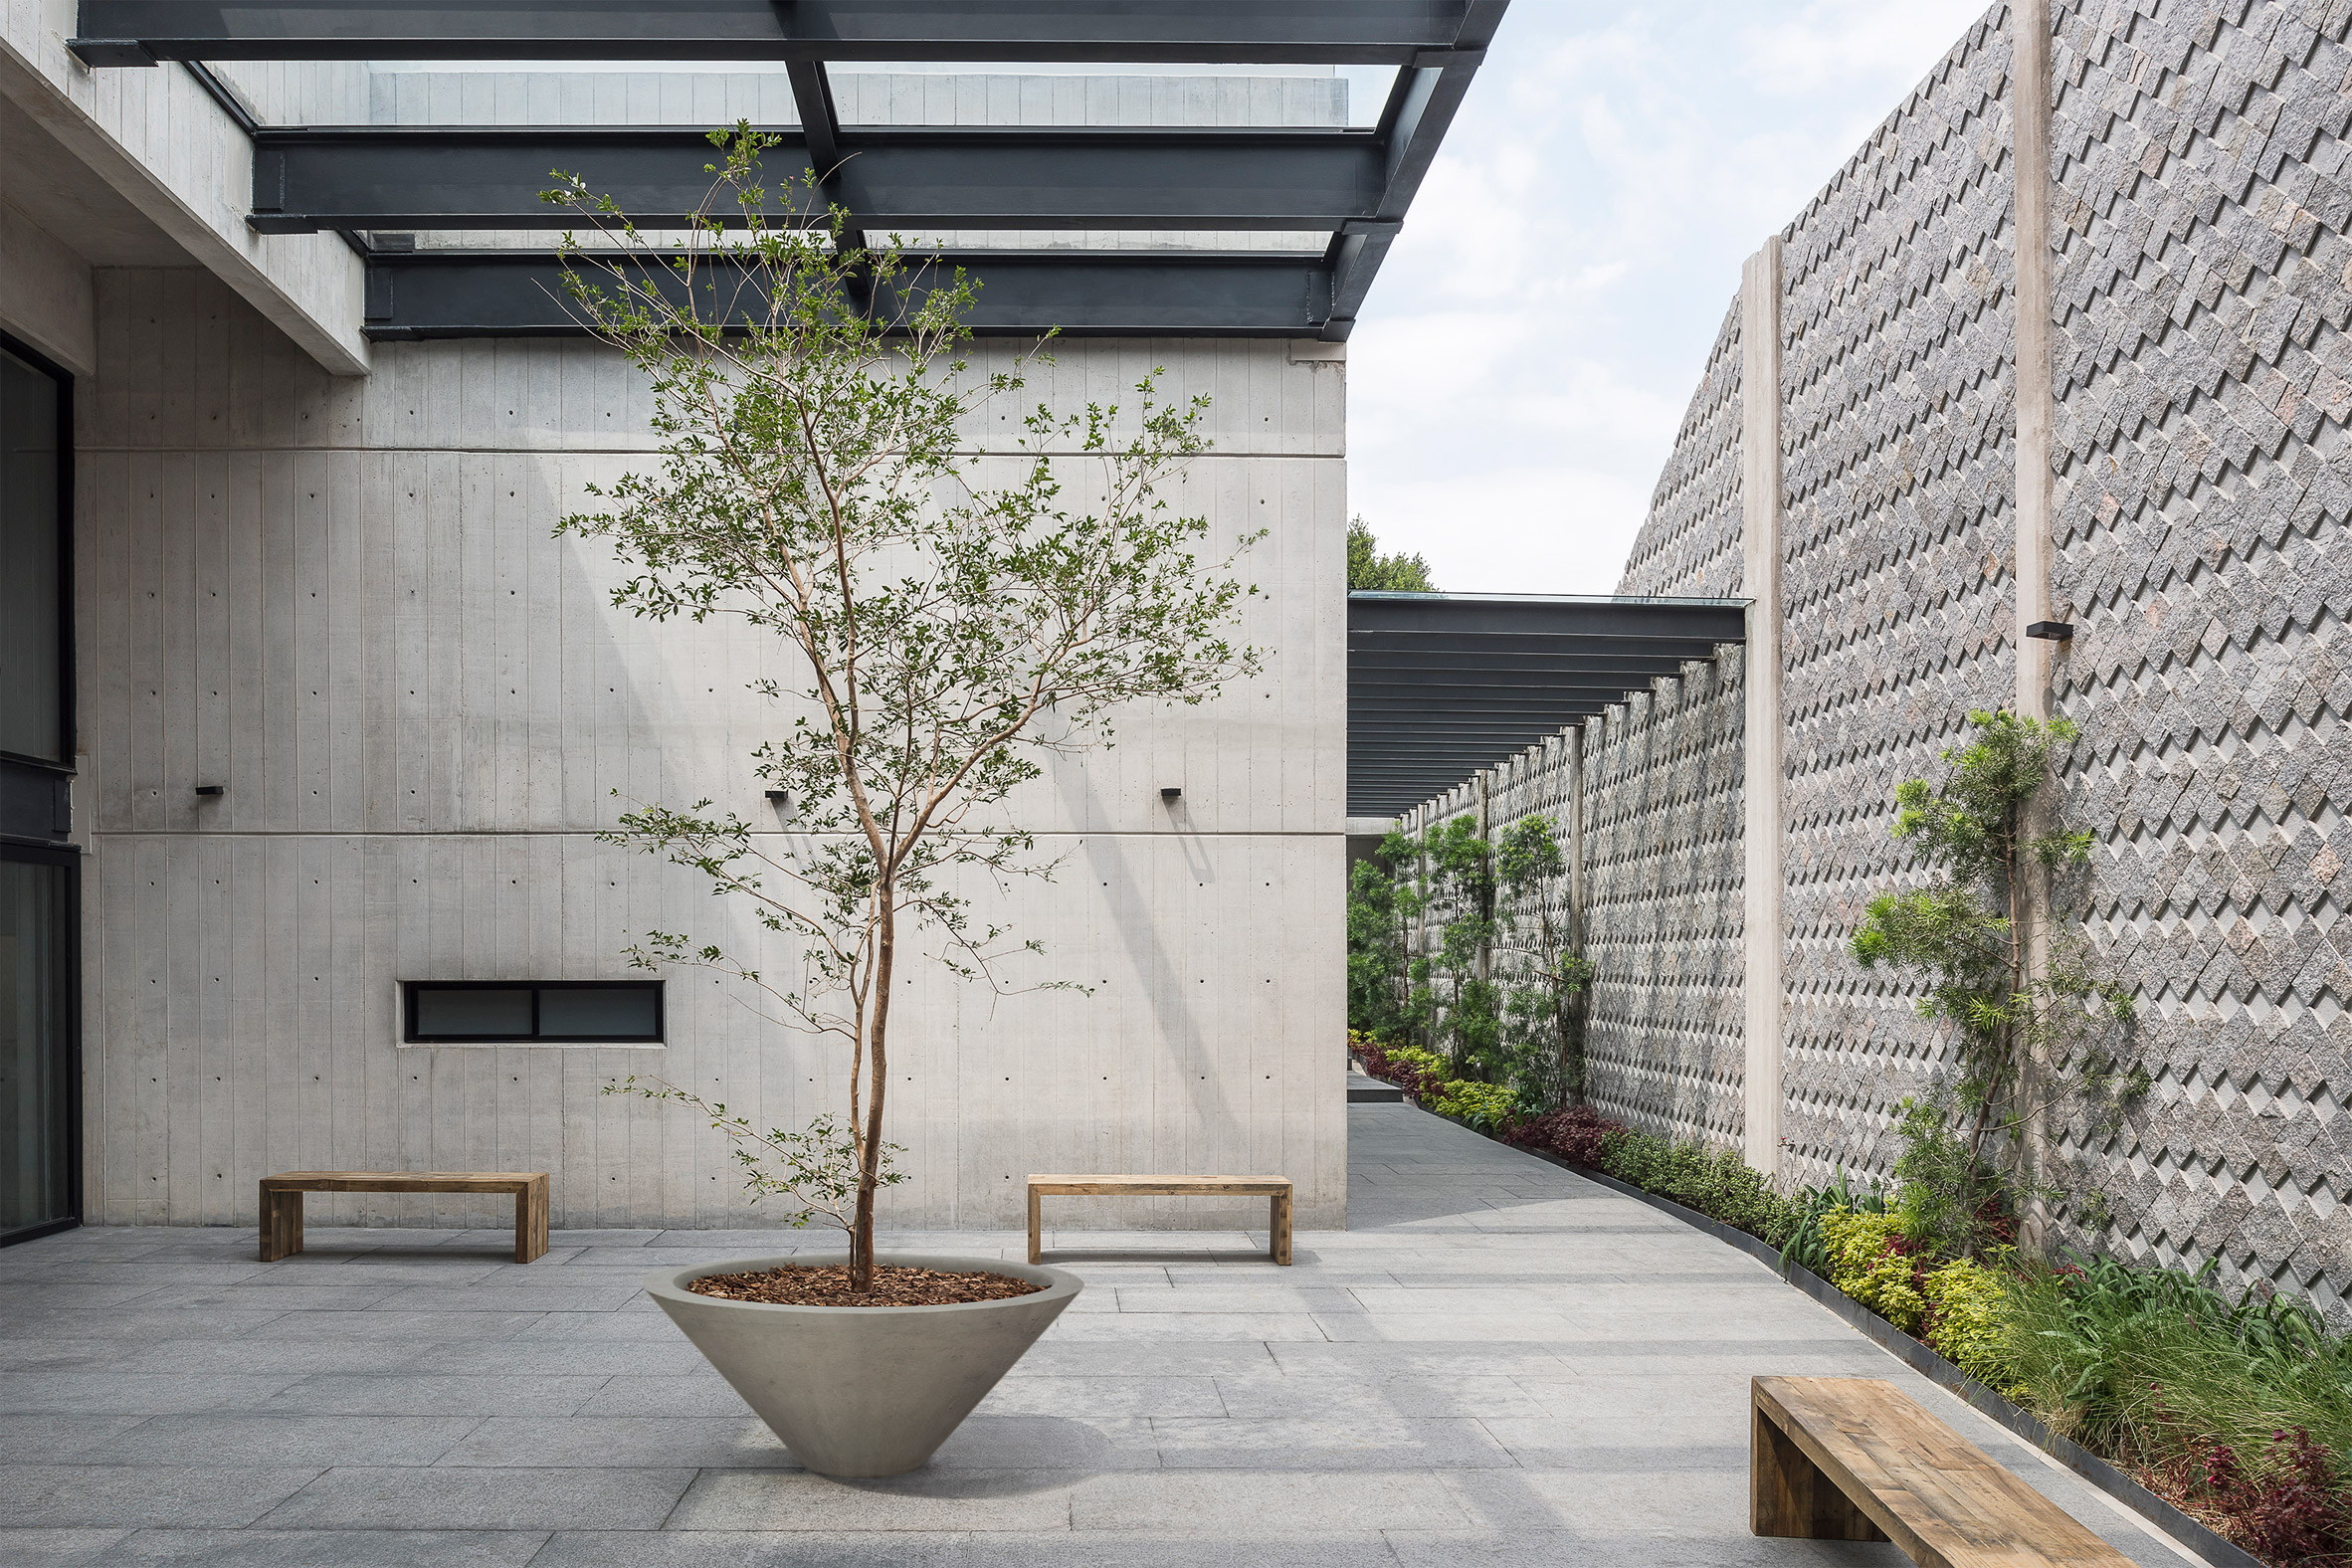 Taller Estrella by Belzberg Architects